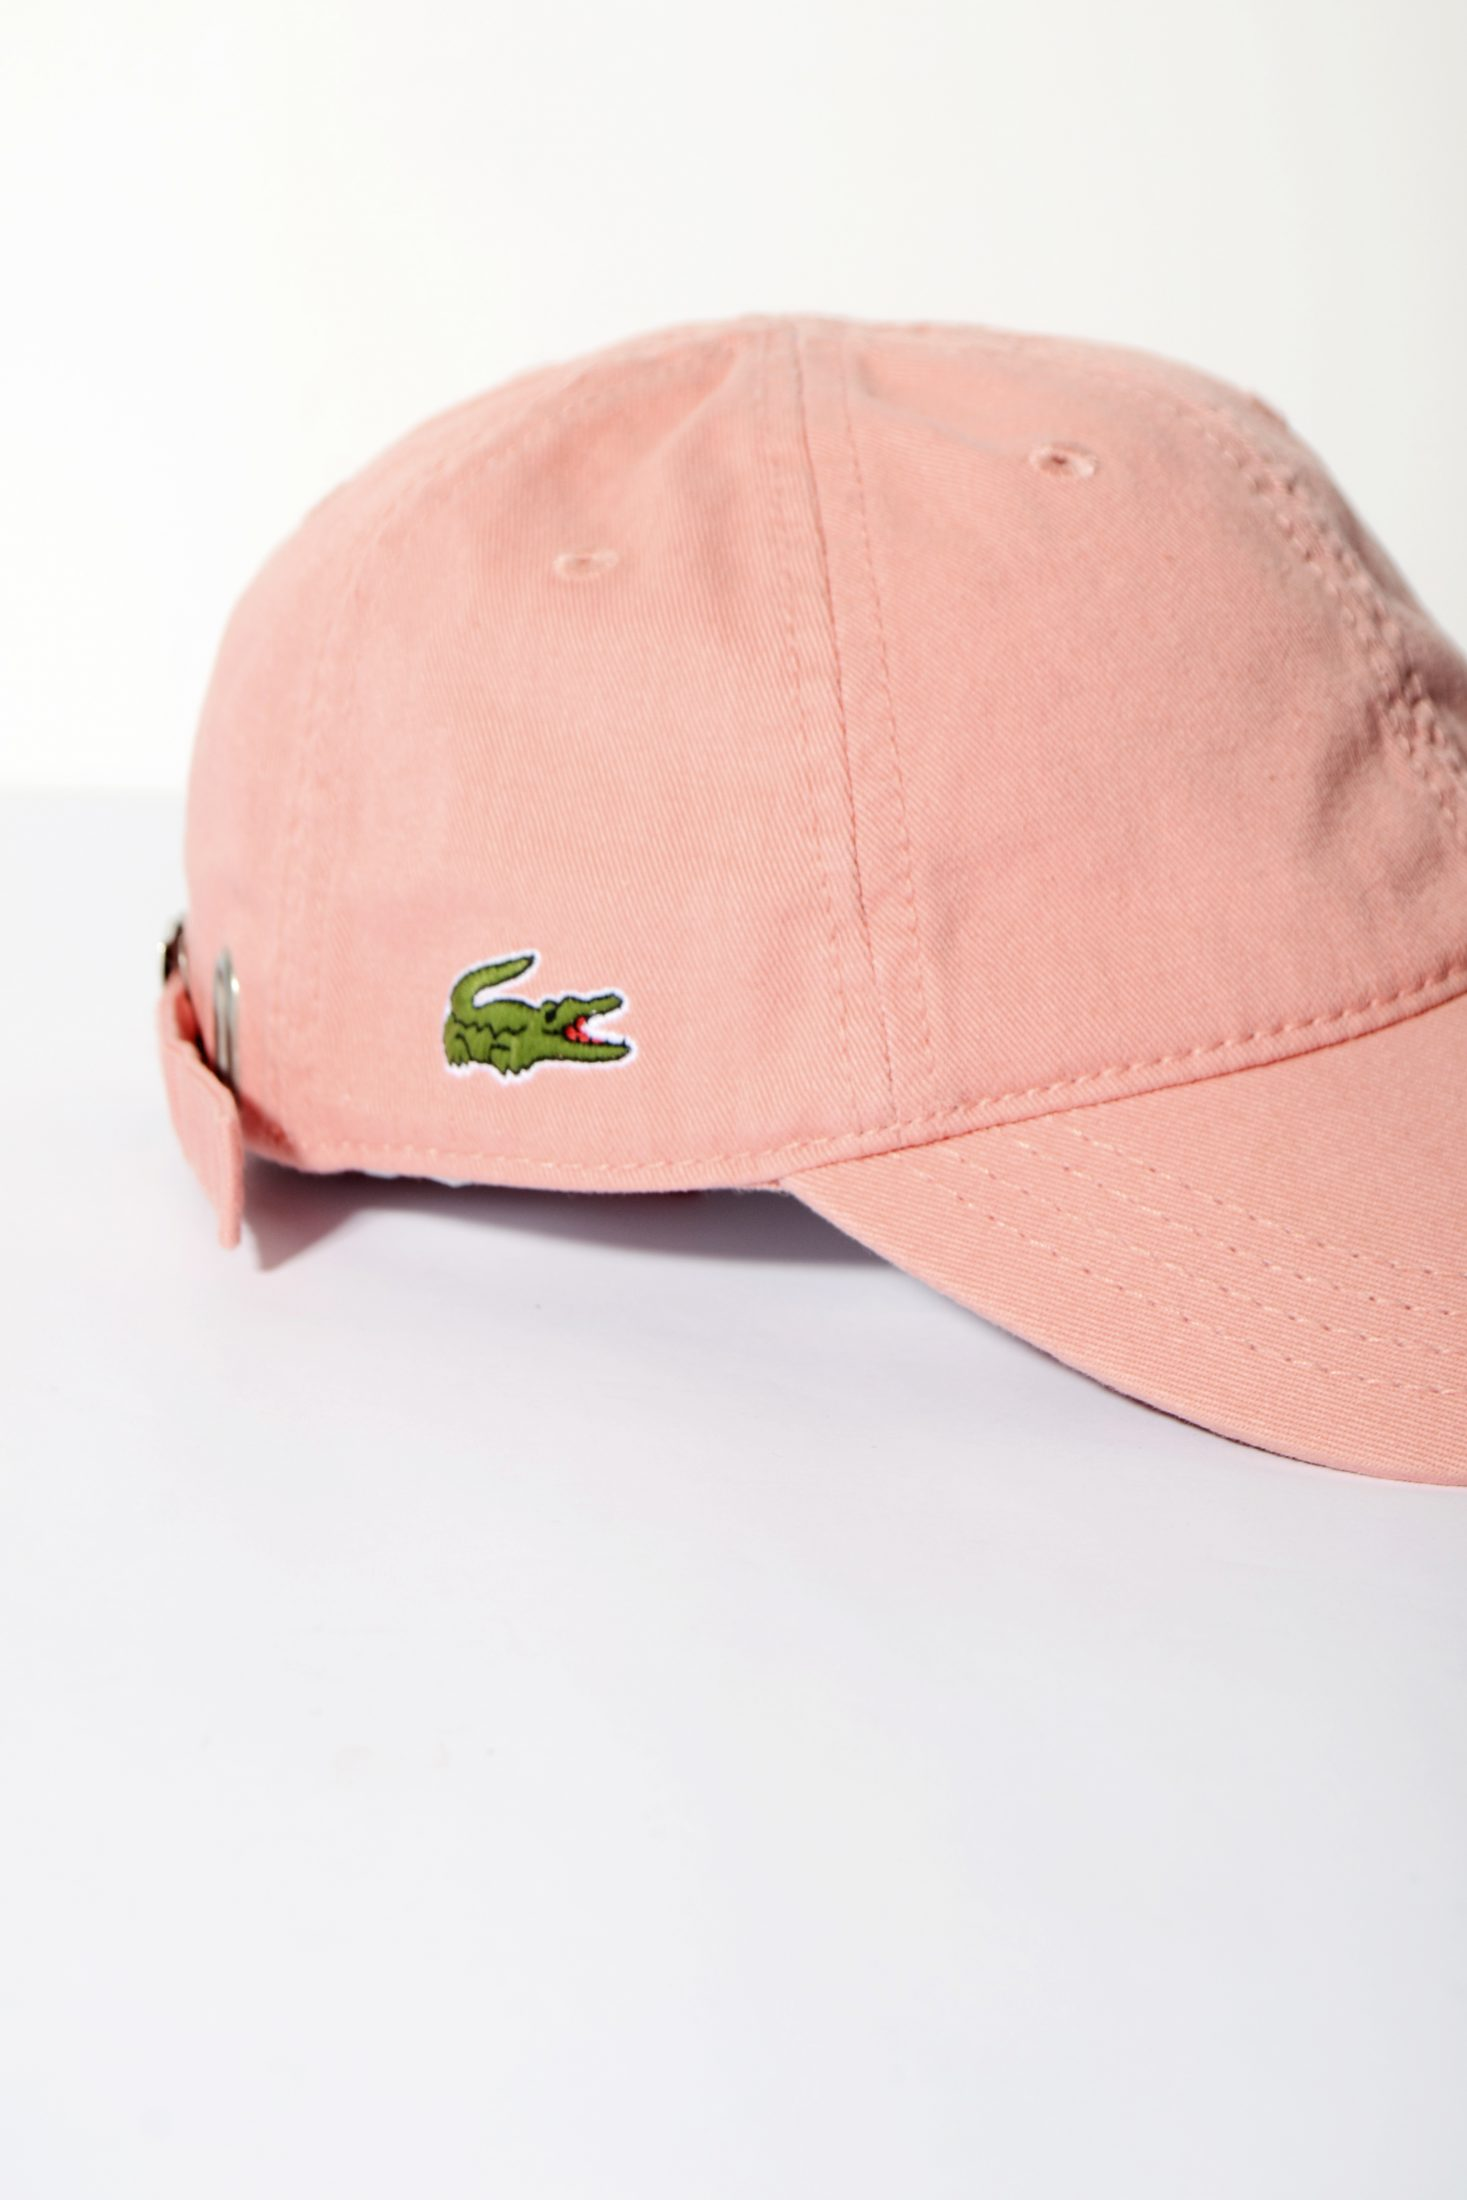 3bda69f46 LACOSTE vintage pink baseball cap